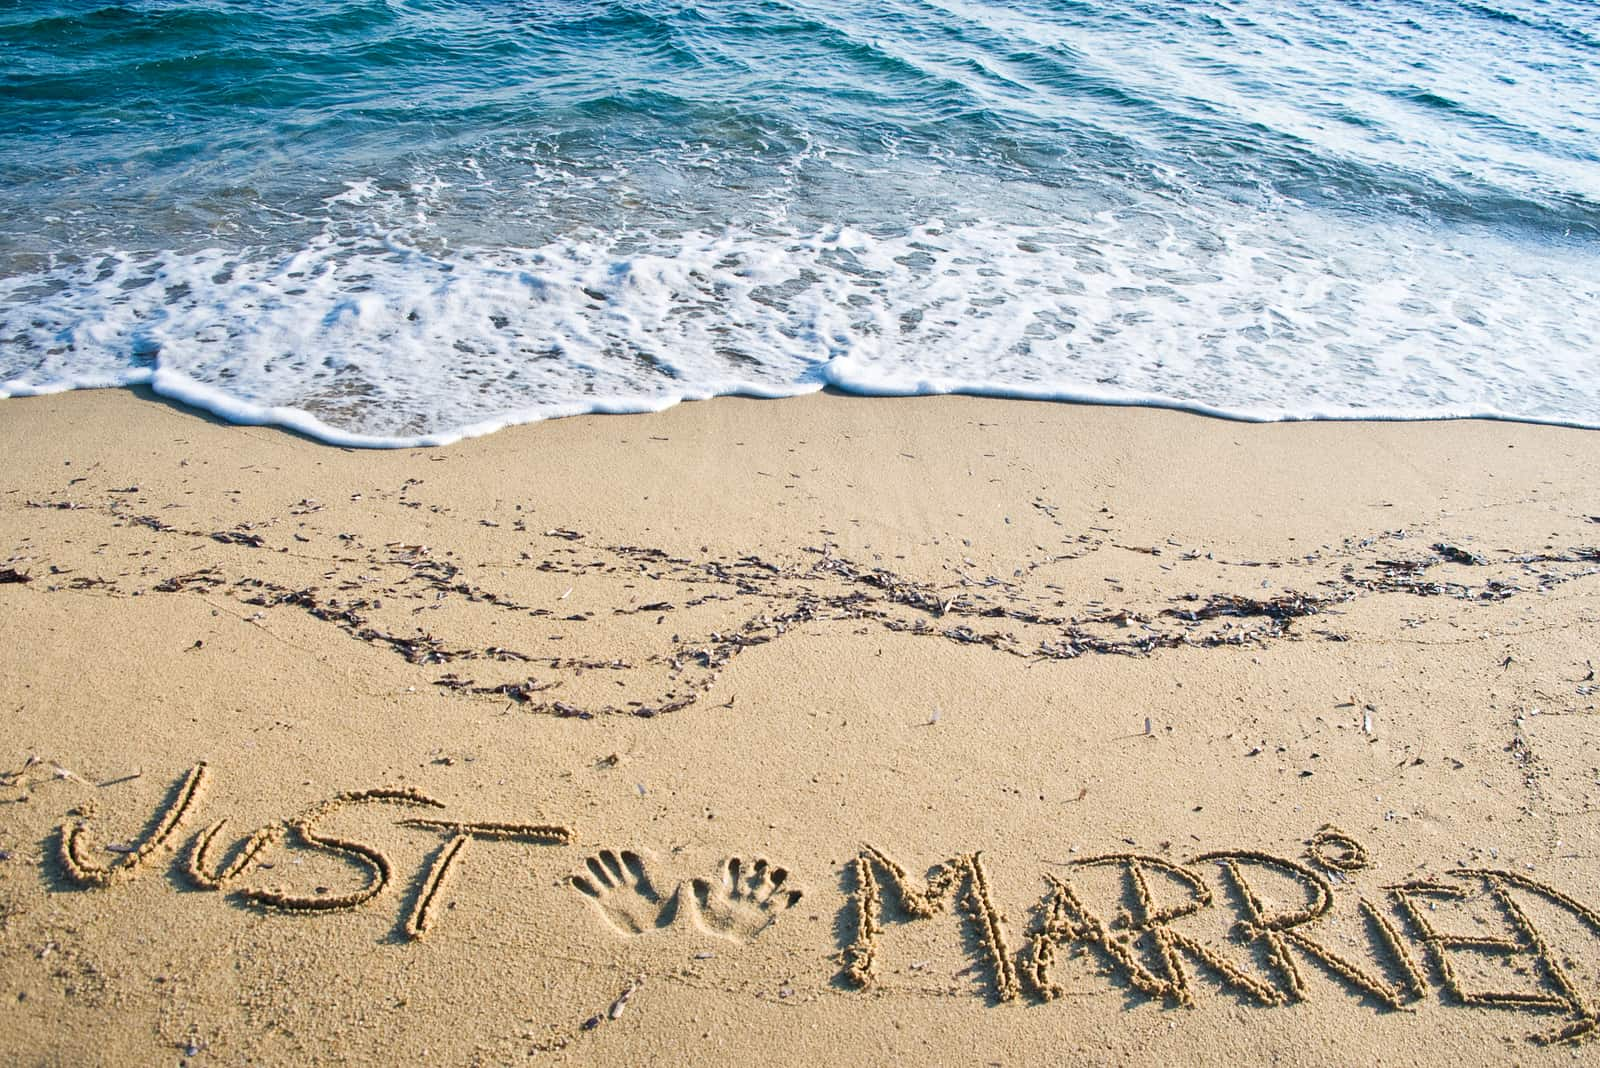 Just Married in Sand on the Beach geschrieben